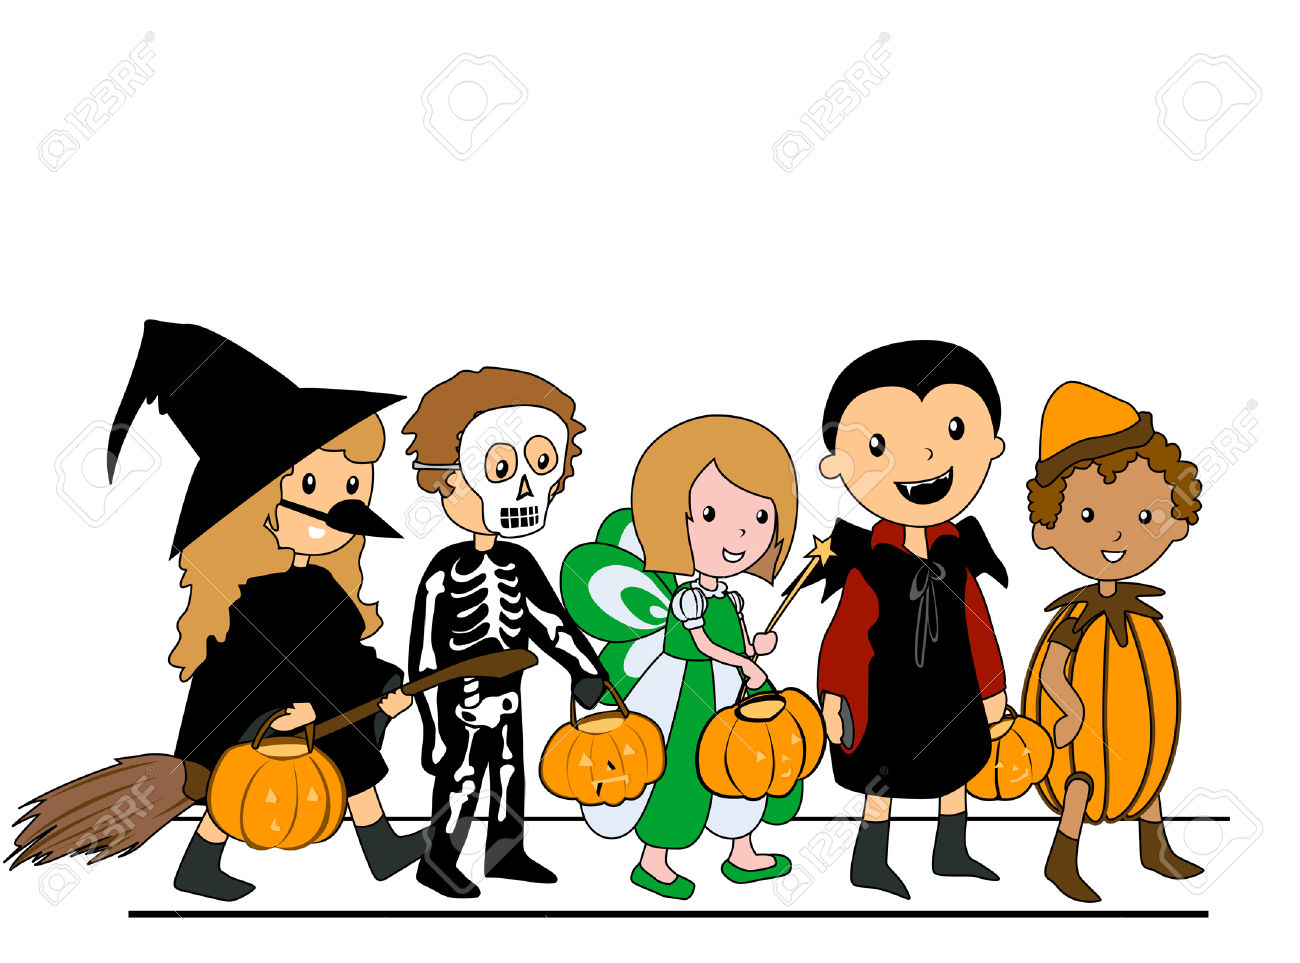 Fun kids halloween clipart svg transparent download Halloween Clipart For Kids   Free download best Halloween Clipart ... svg transparent download